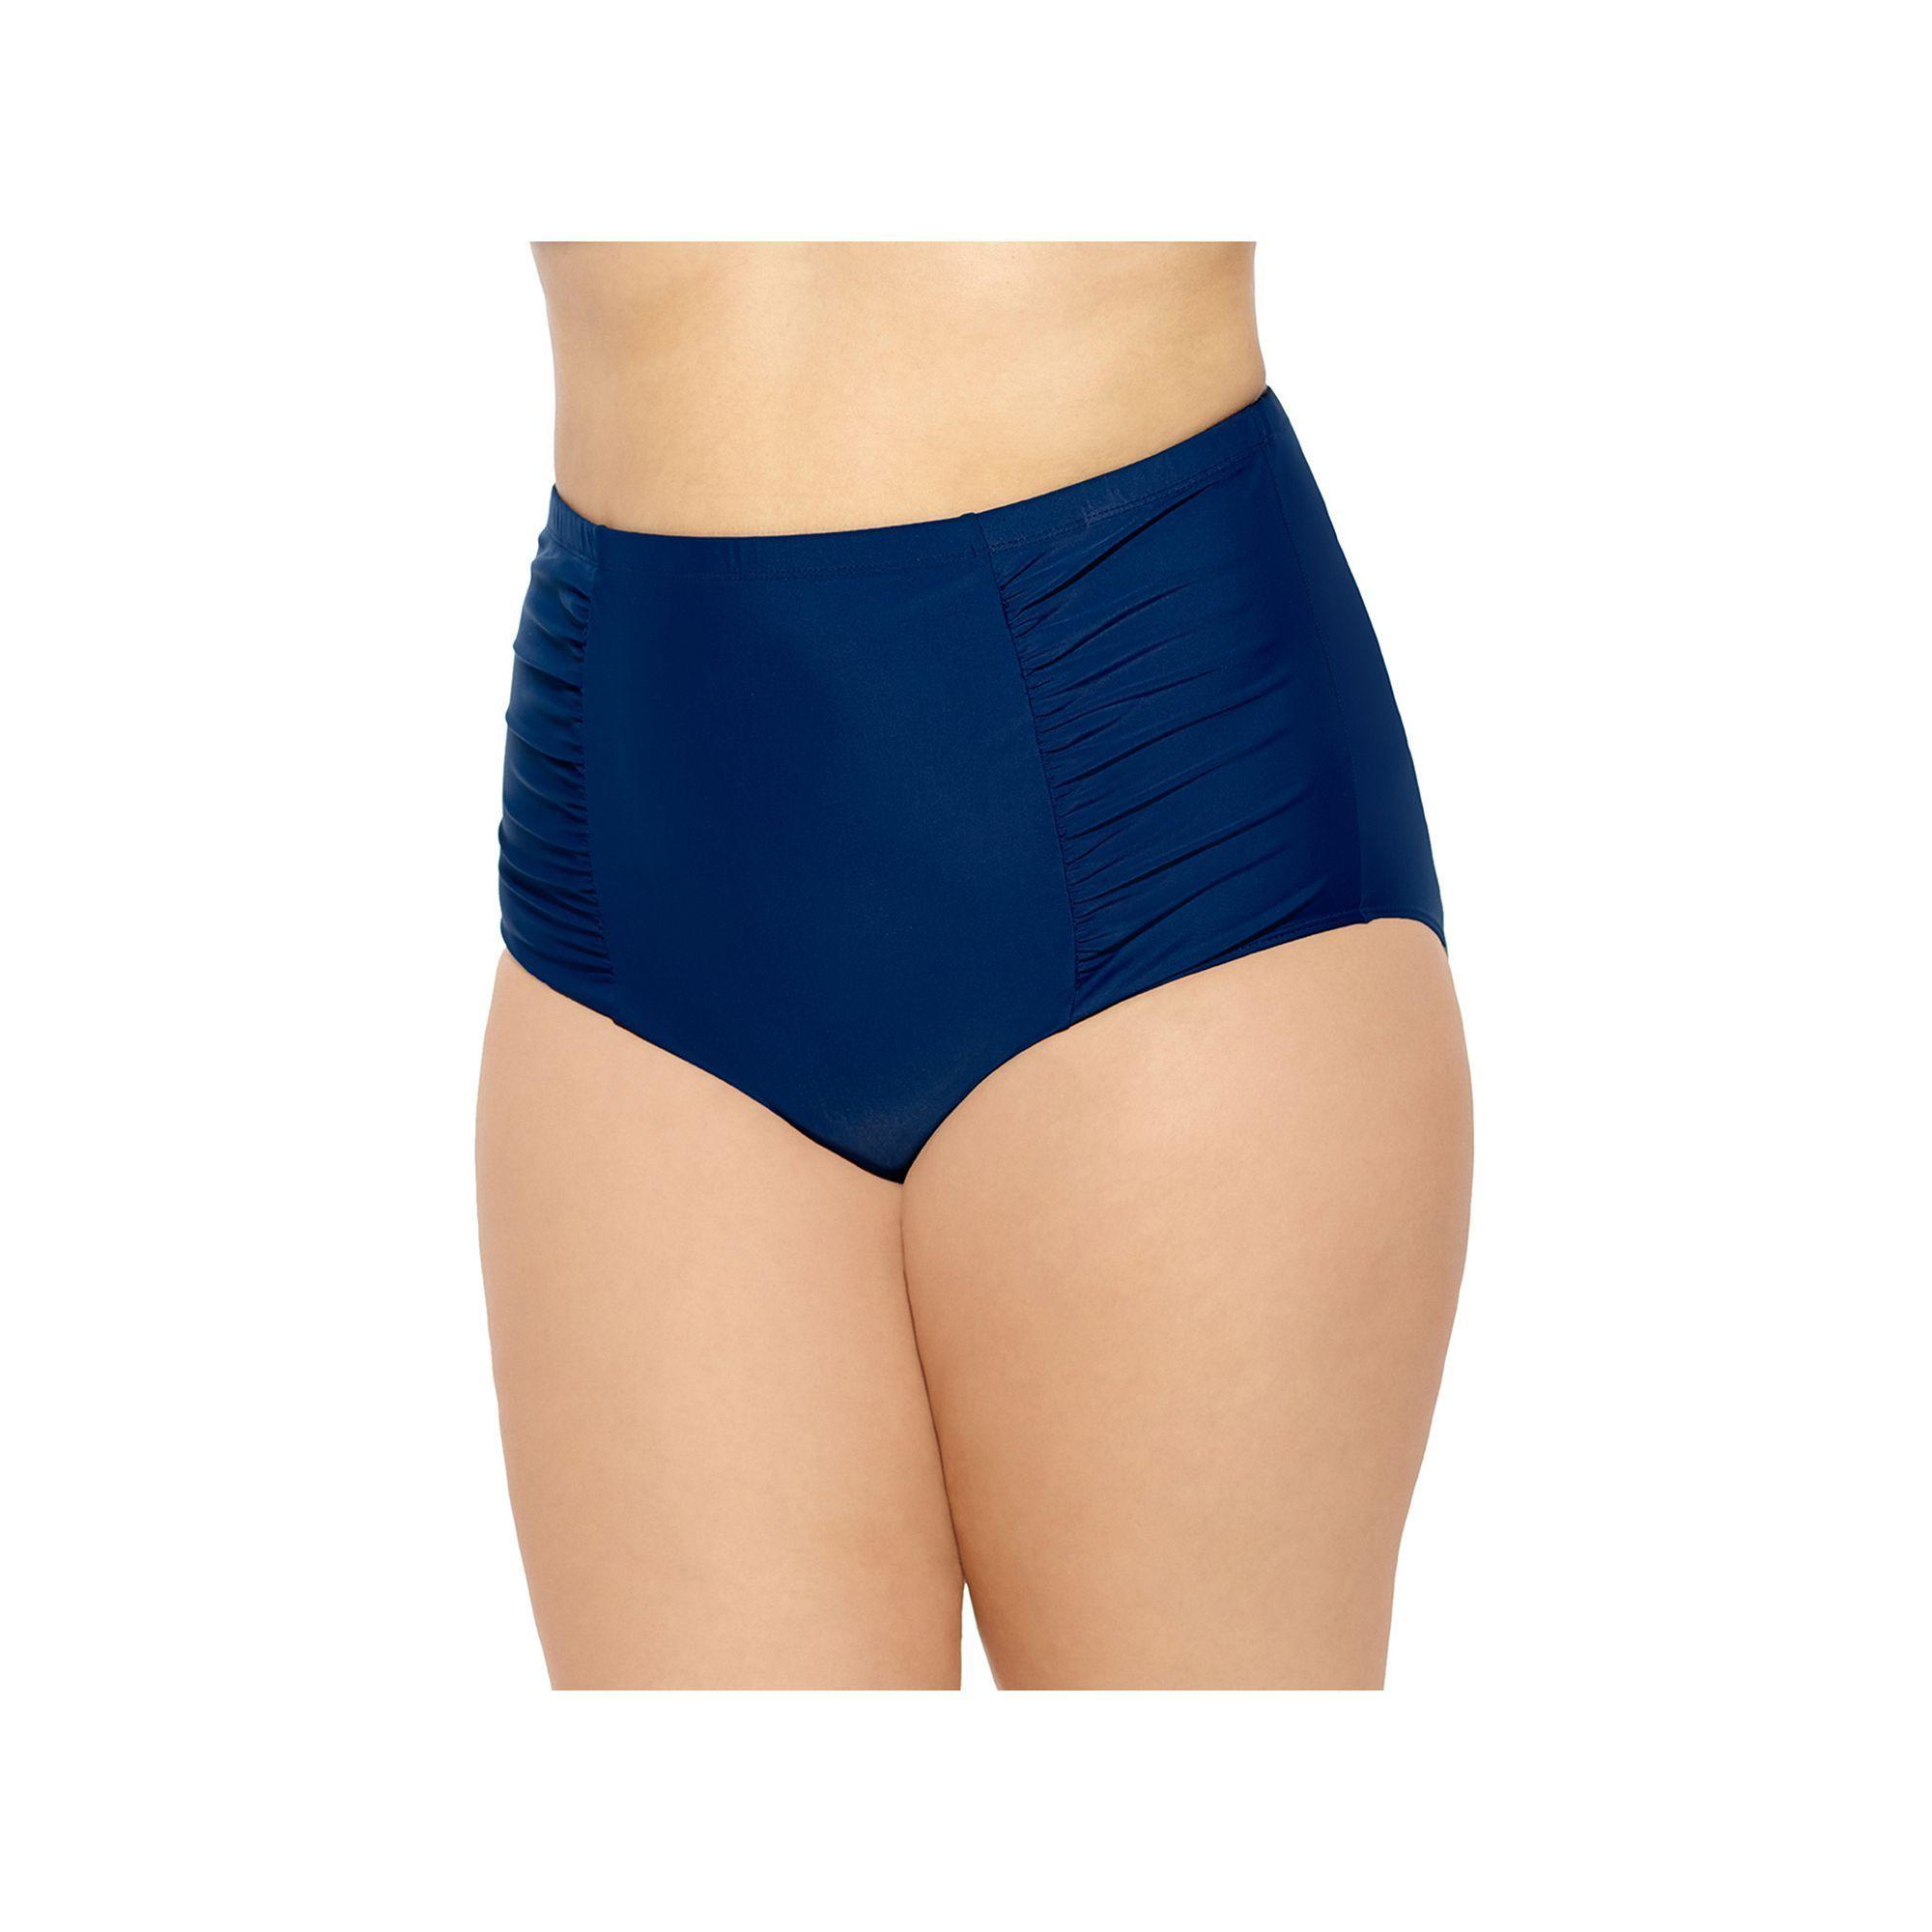 6b8fdd5549c18 Juniors' Plus Size Costa Del Sol Solid High-Waisted Bikini Bottoms, Size:  2XL, Dark Blue